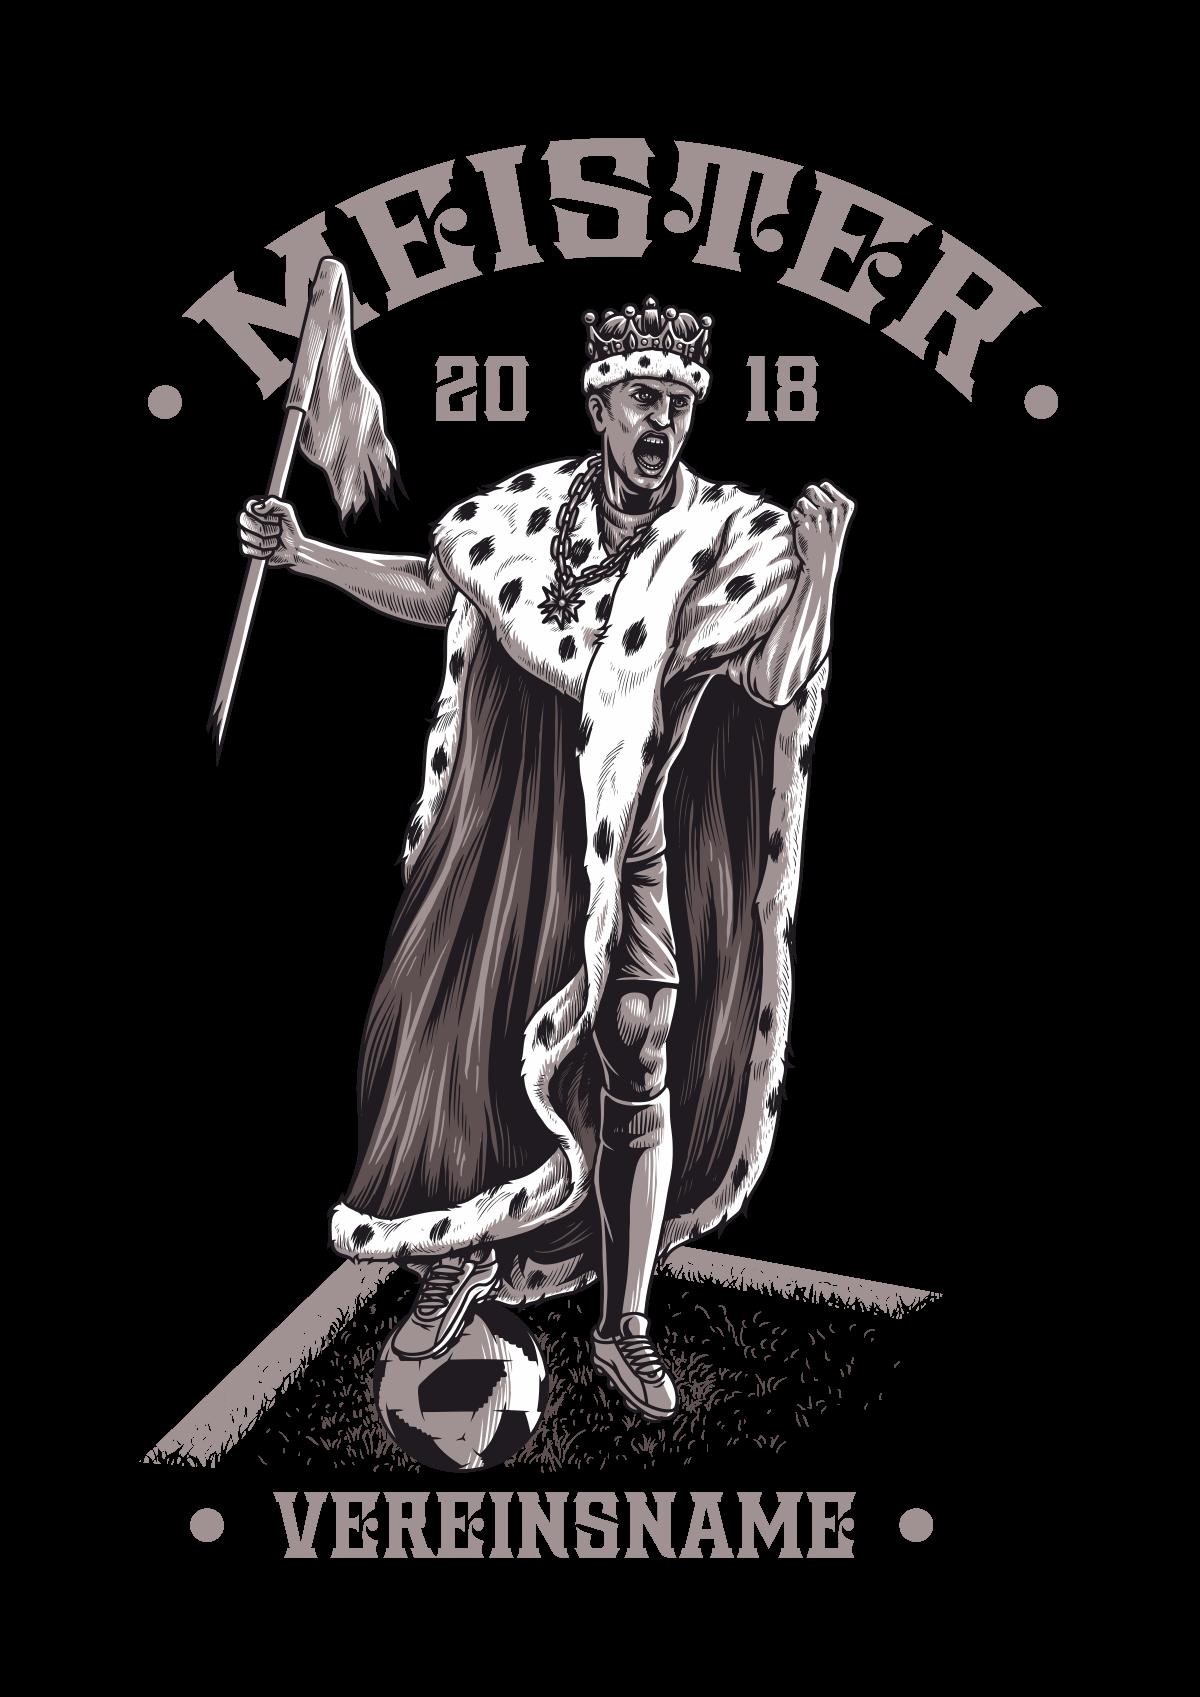 Meister Shirt Design (Championship Shirt)